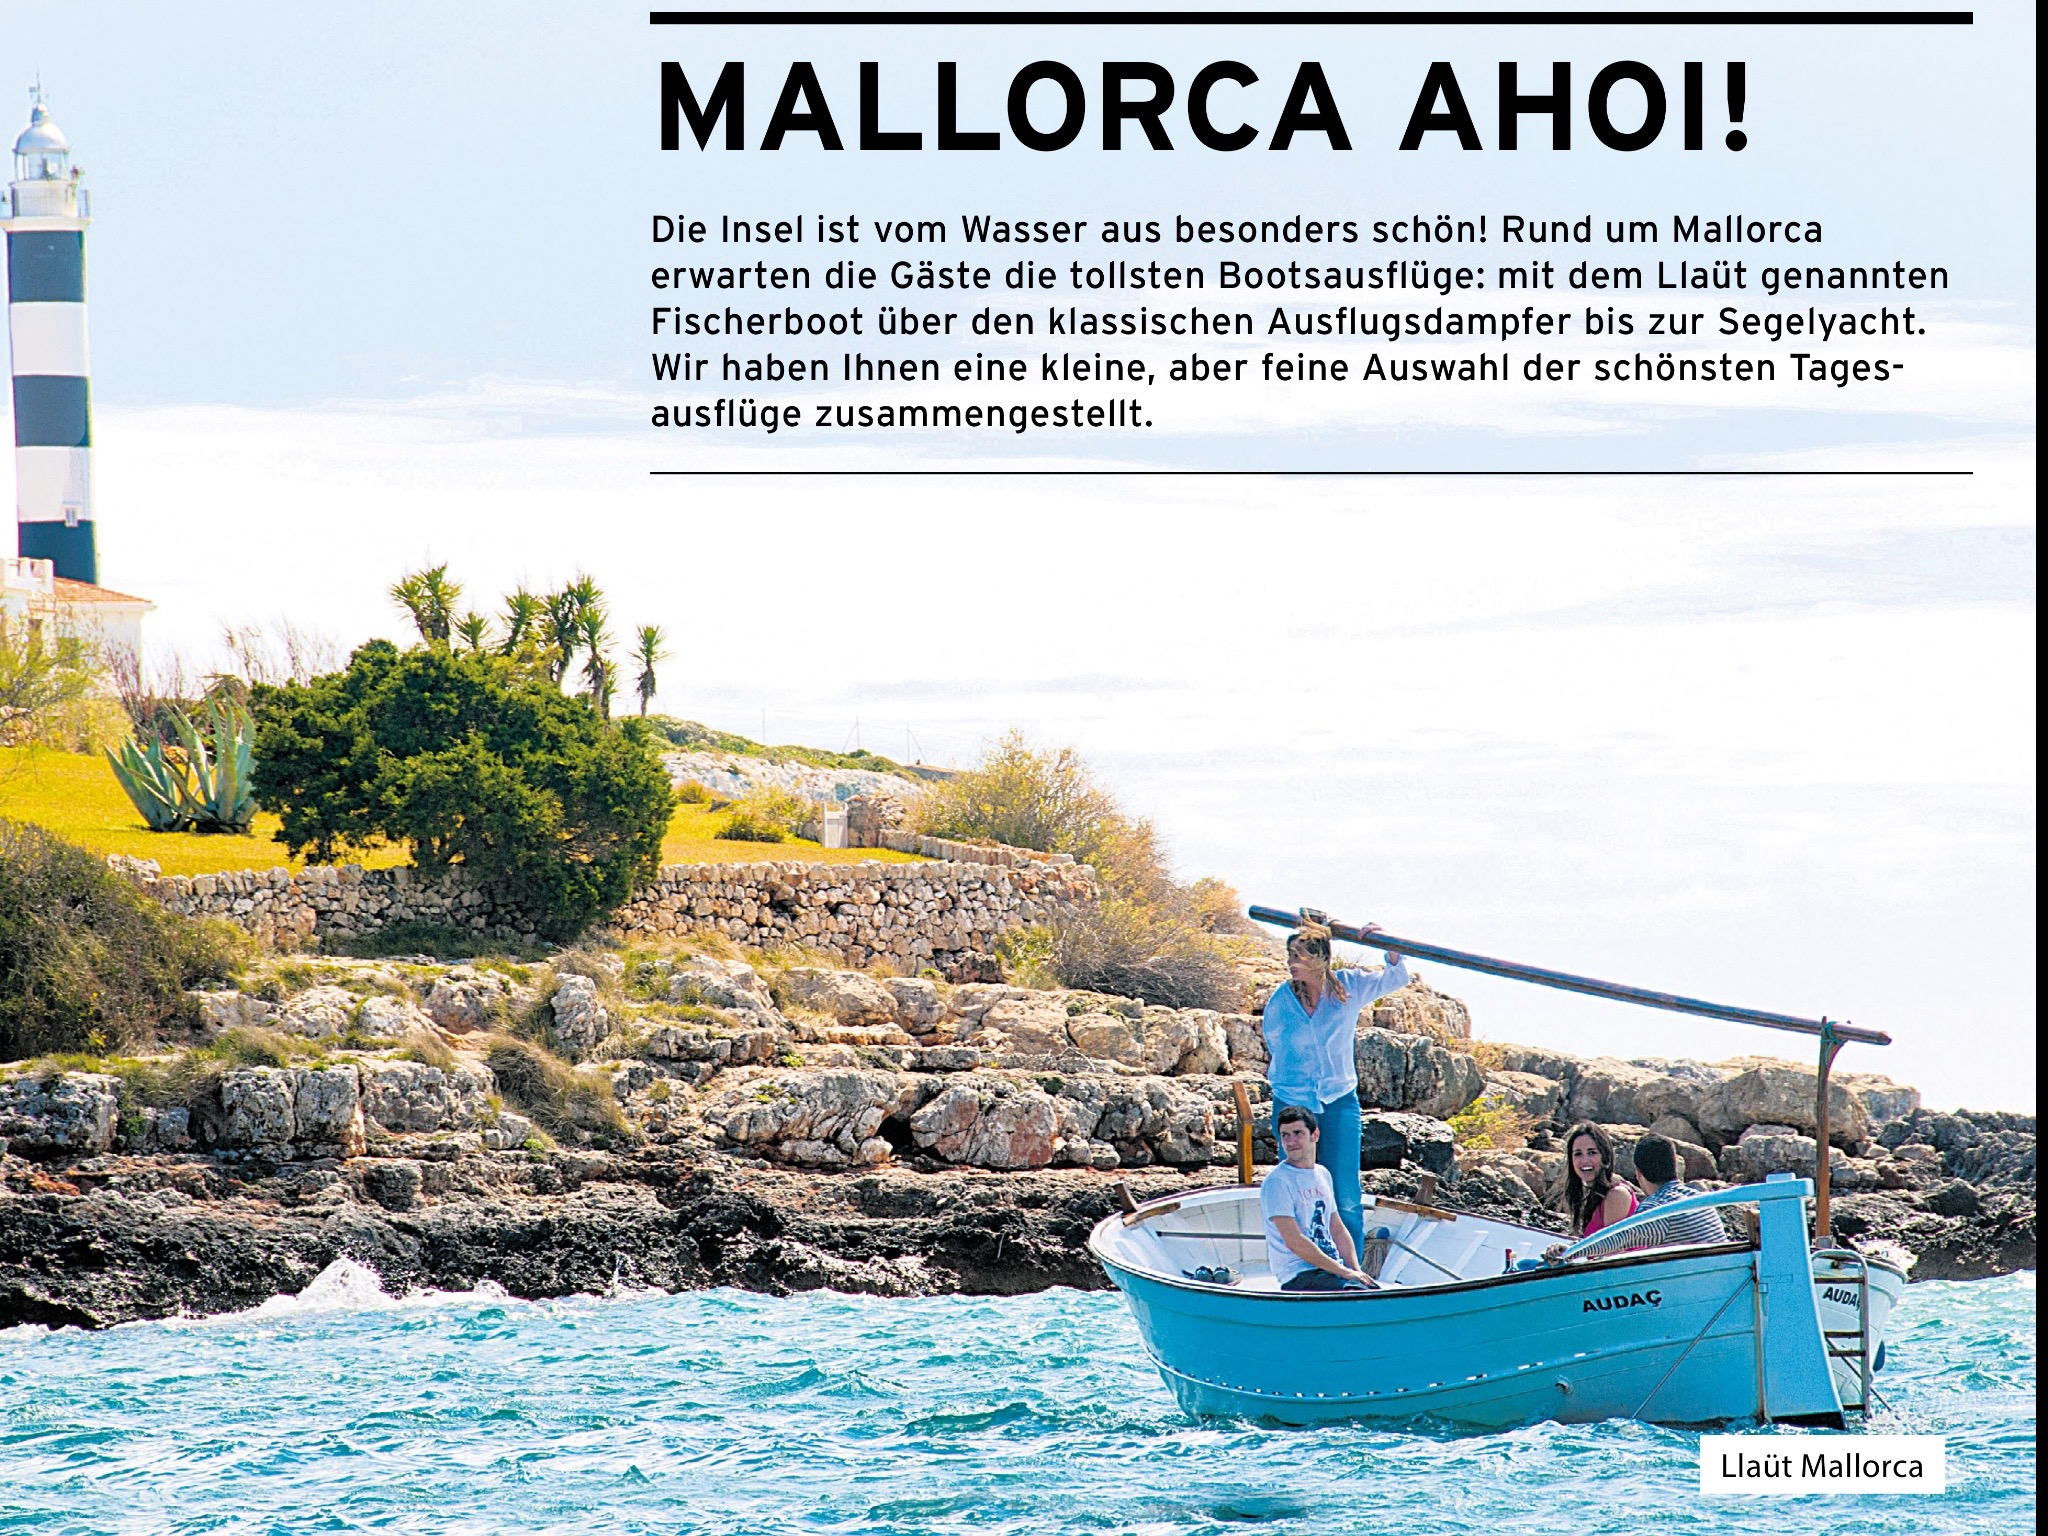 Mallorca Ahoi!